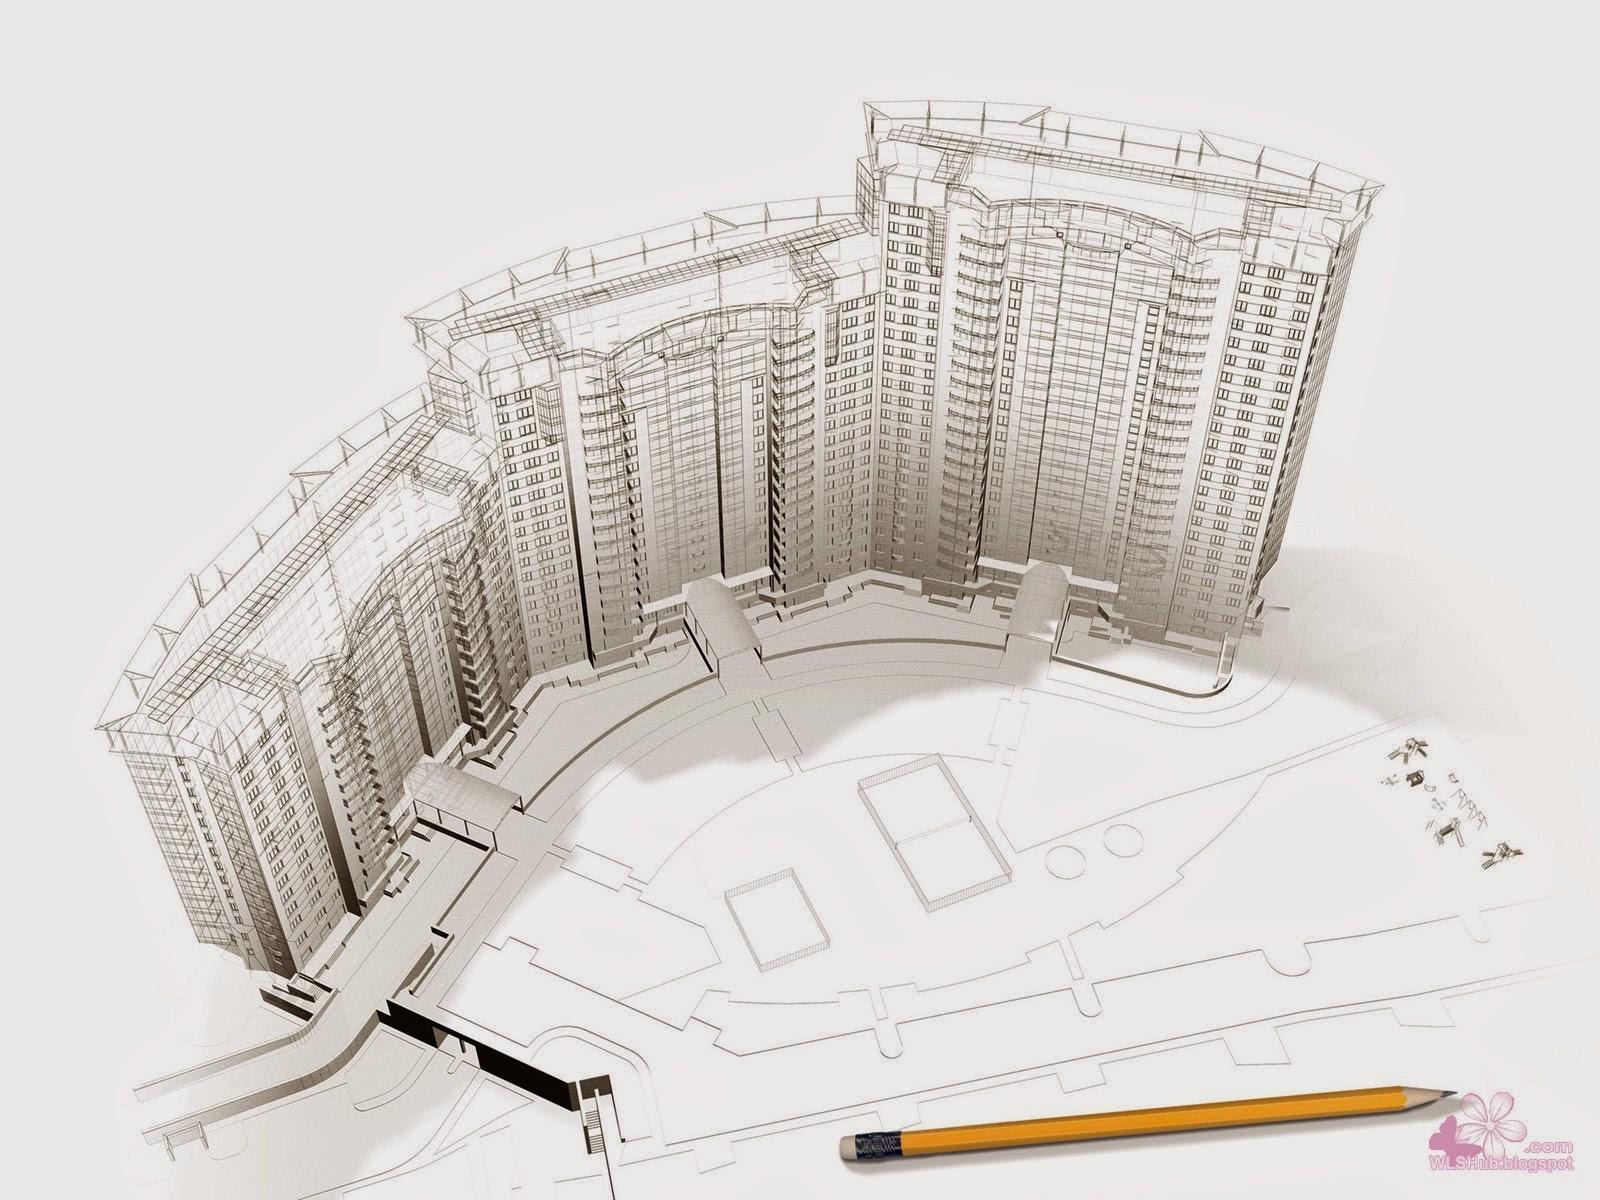 Heidegger architecture essay